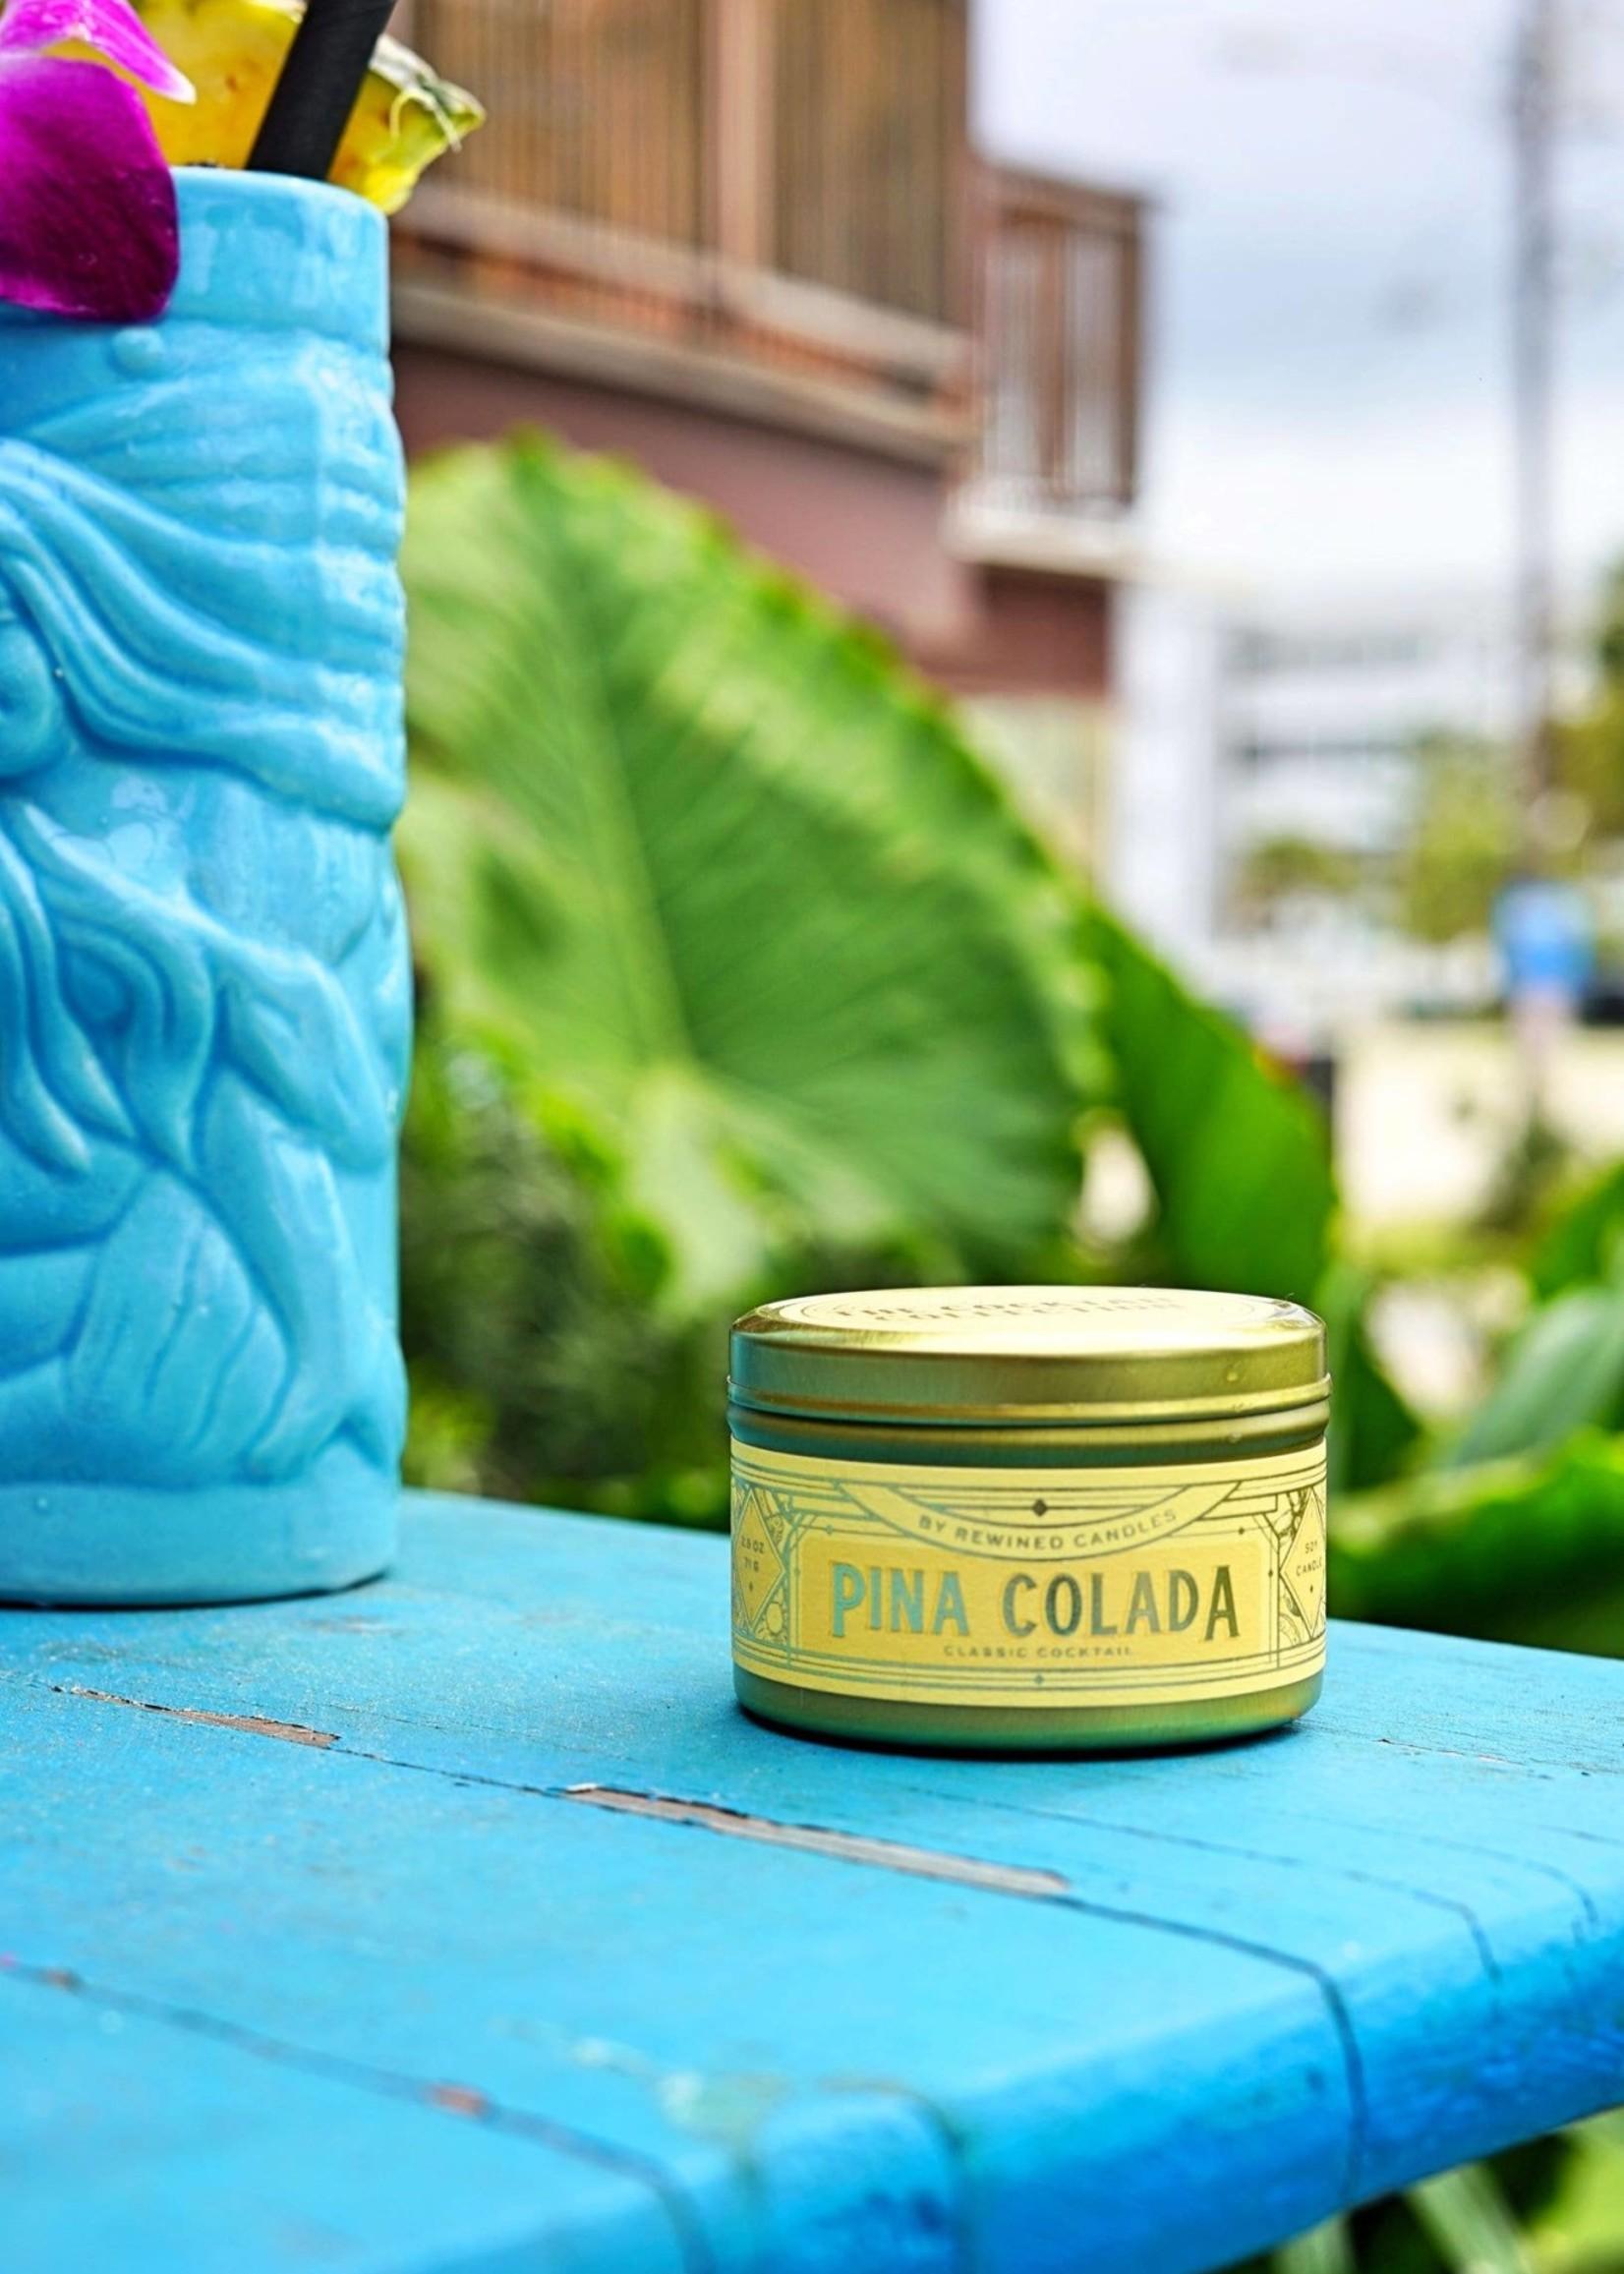 Rewined Pina Colada Travel Tin (2.5 oz)